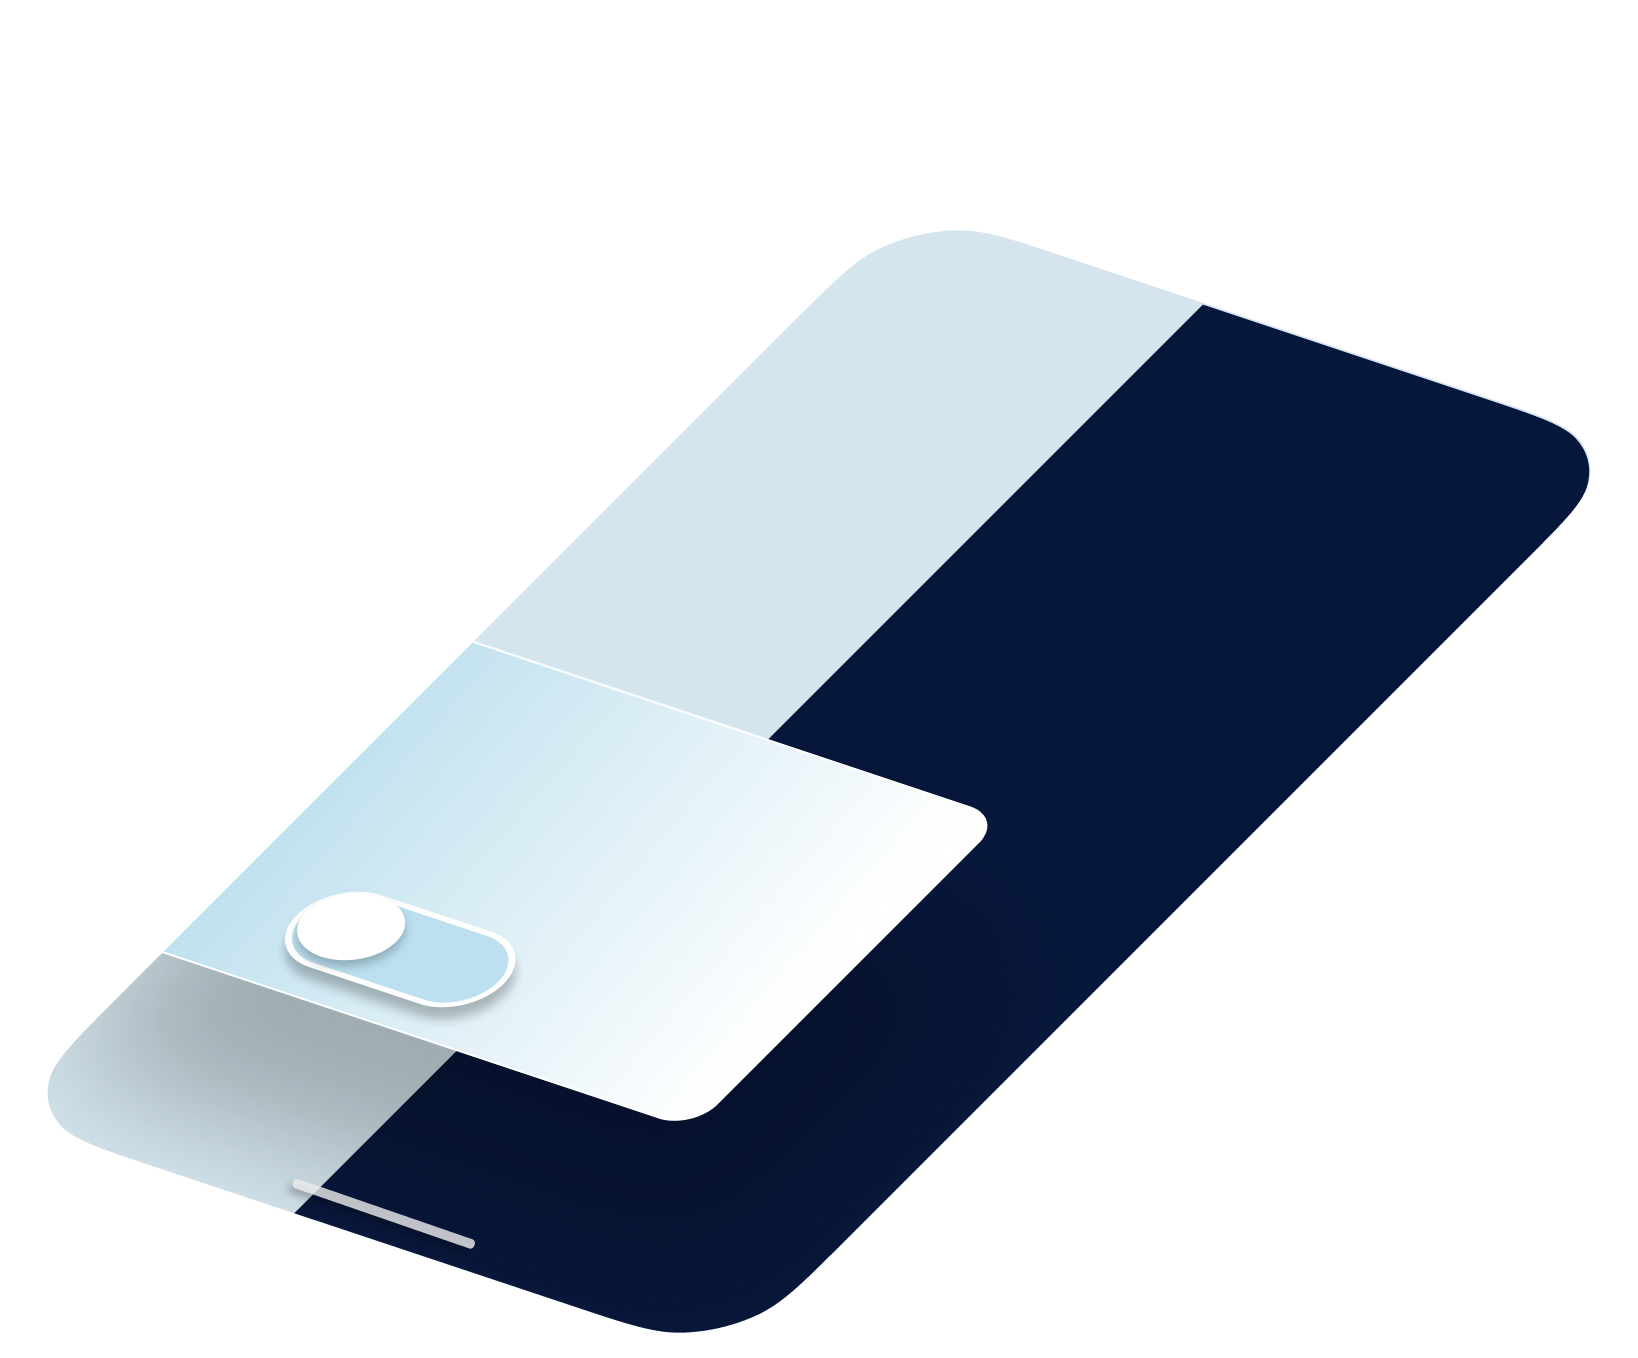 Cross platform mobile developer